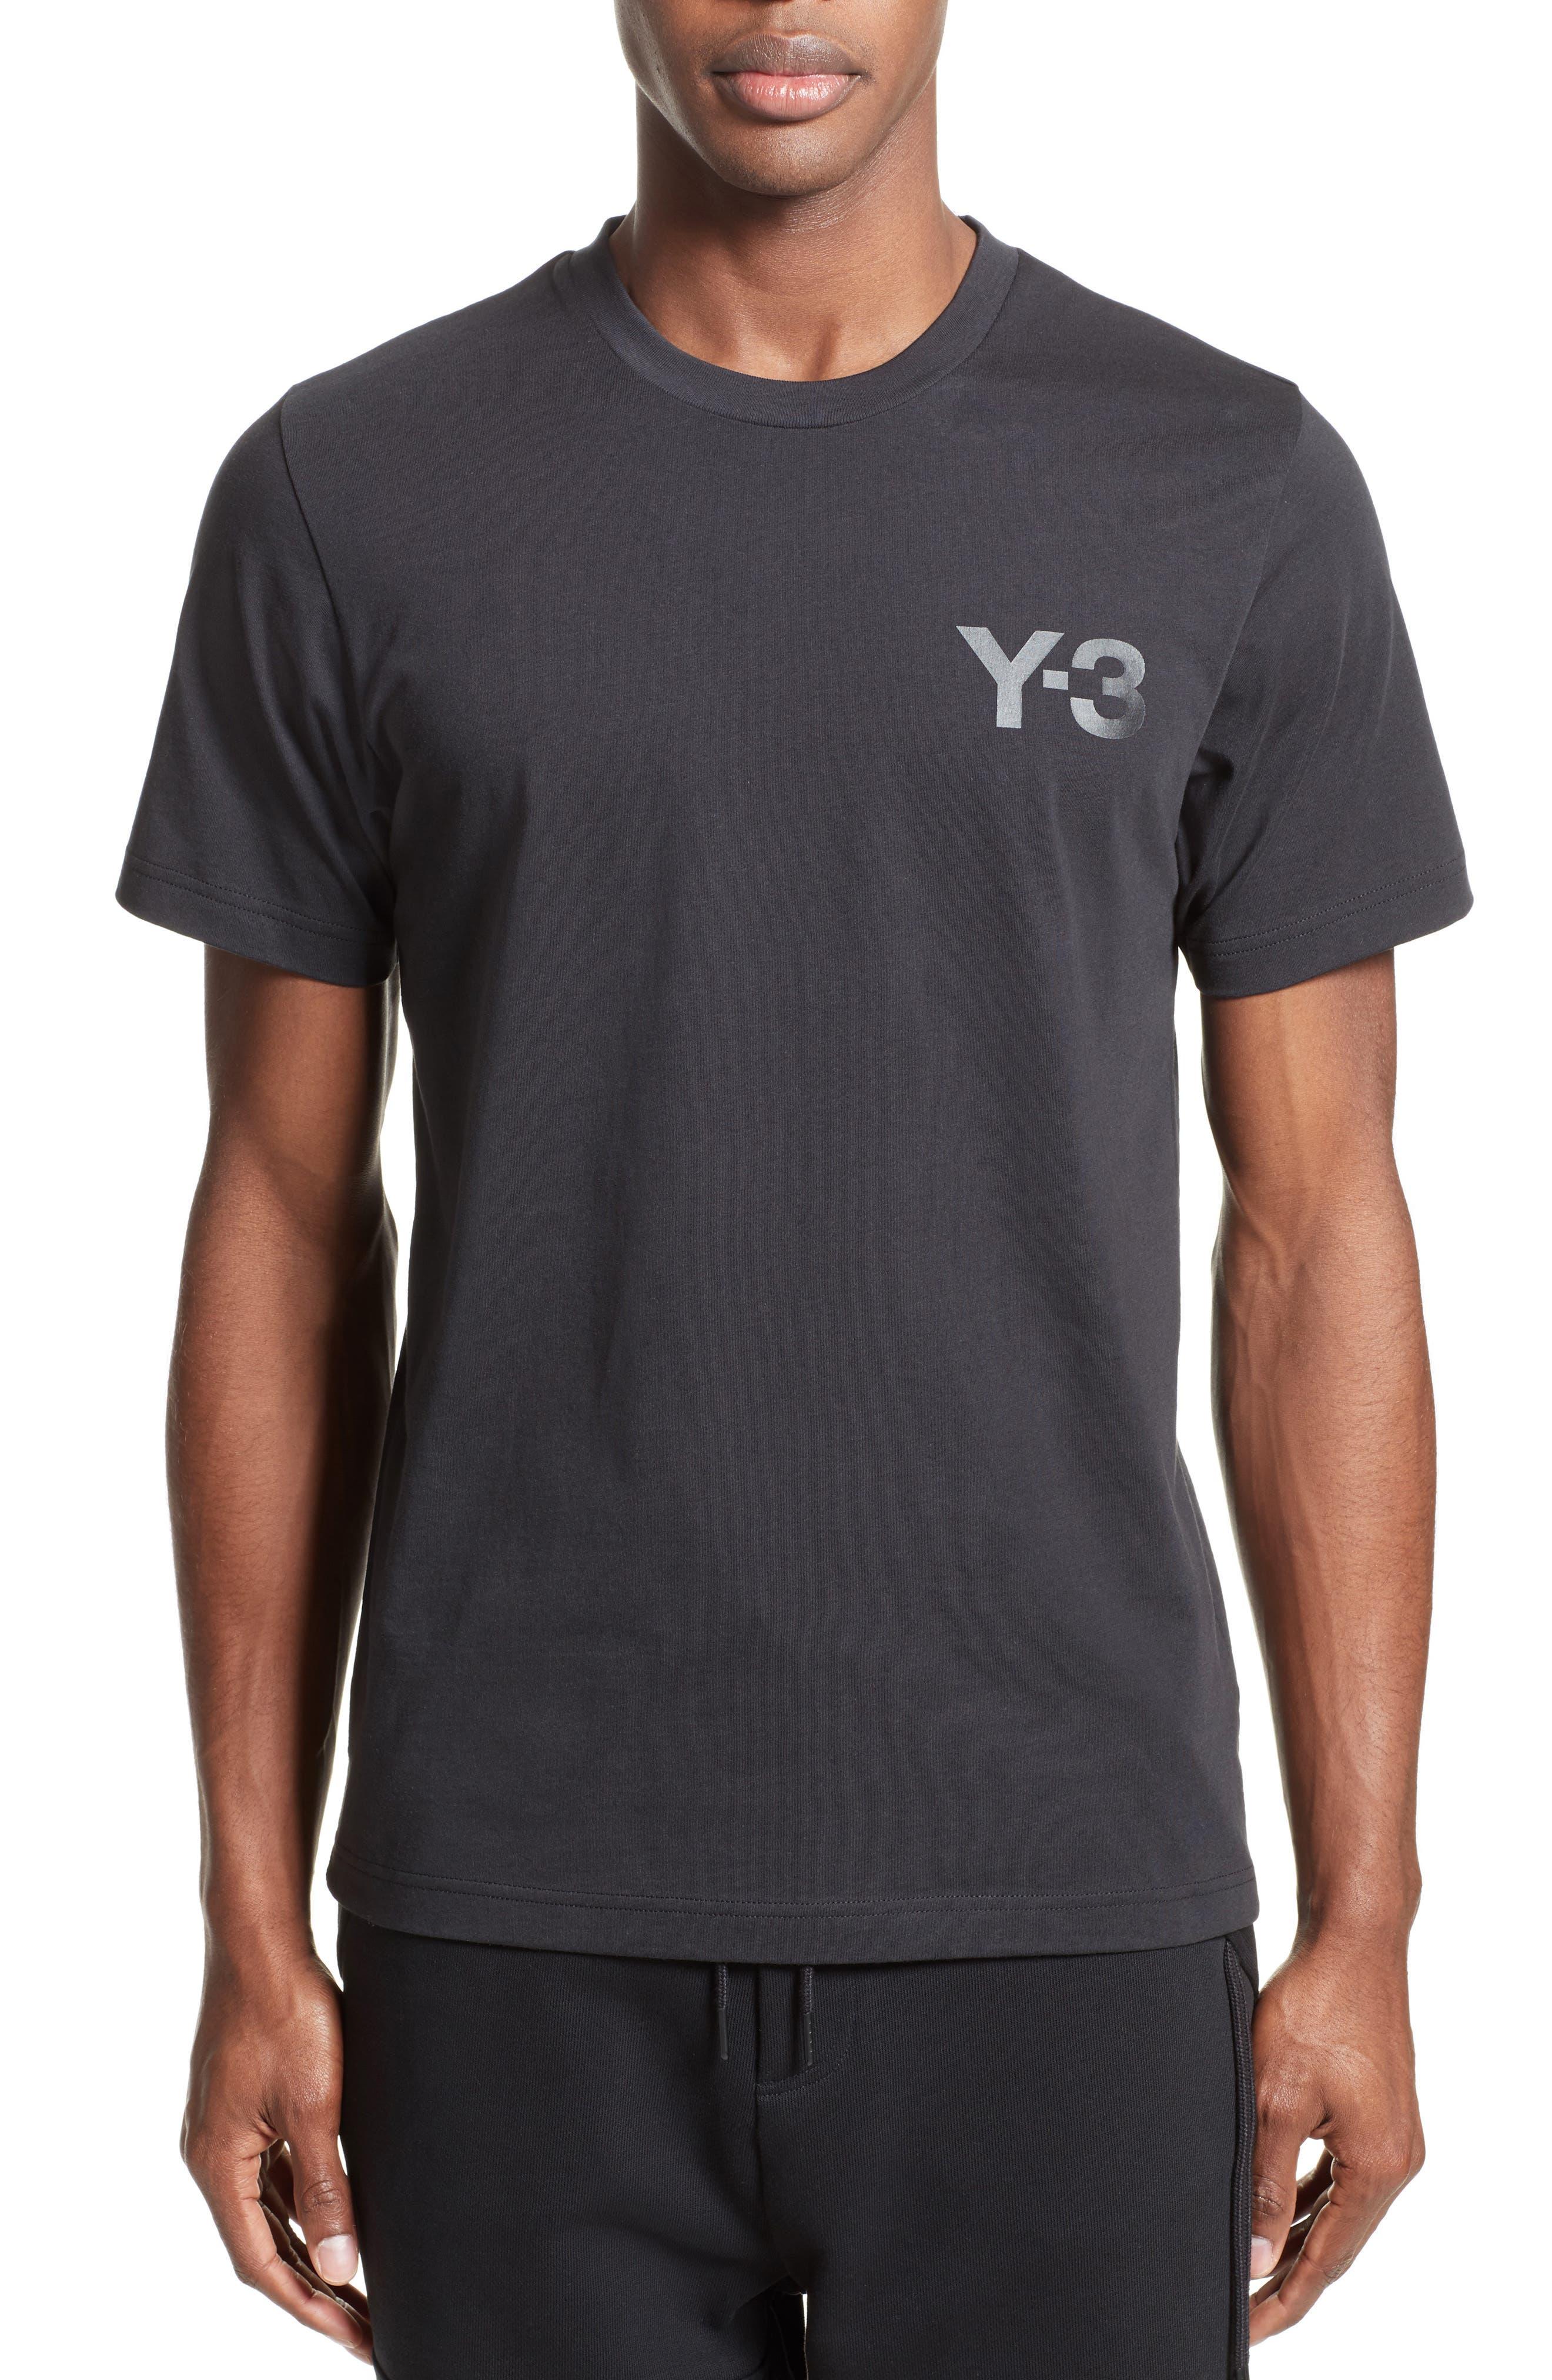 Y-3 Logo Graphic T-Shirt